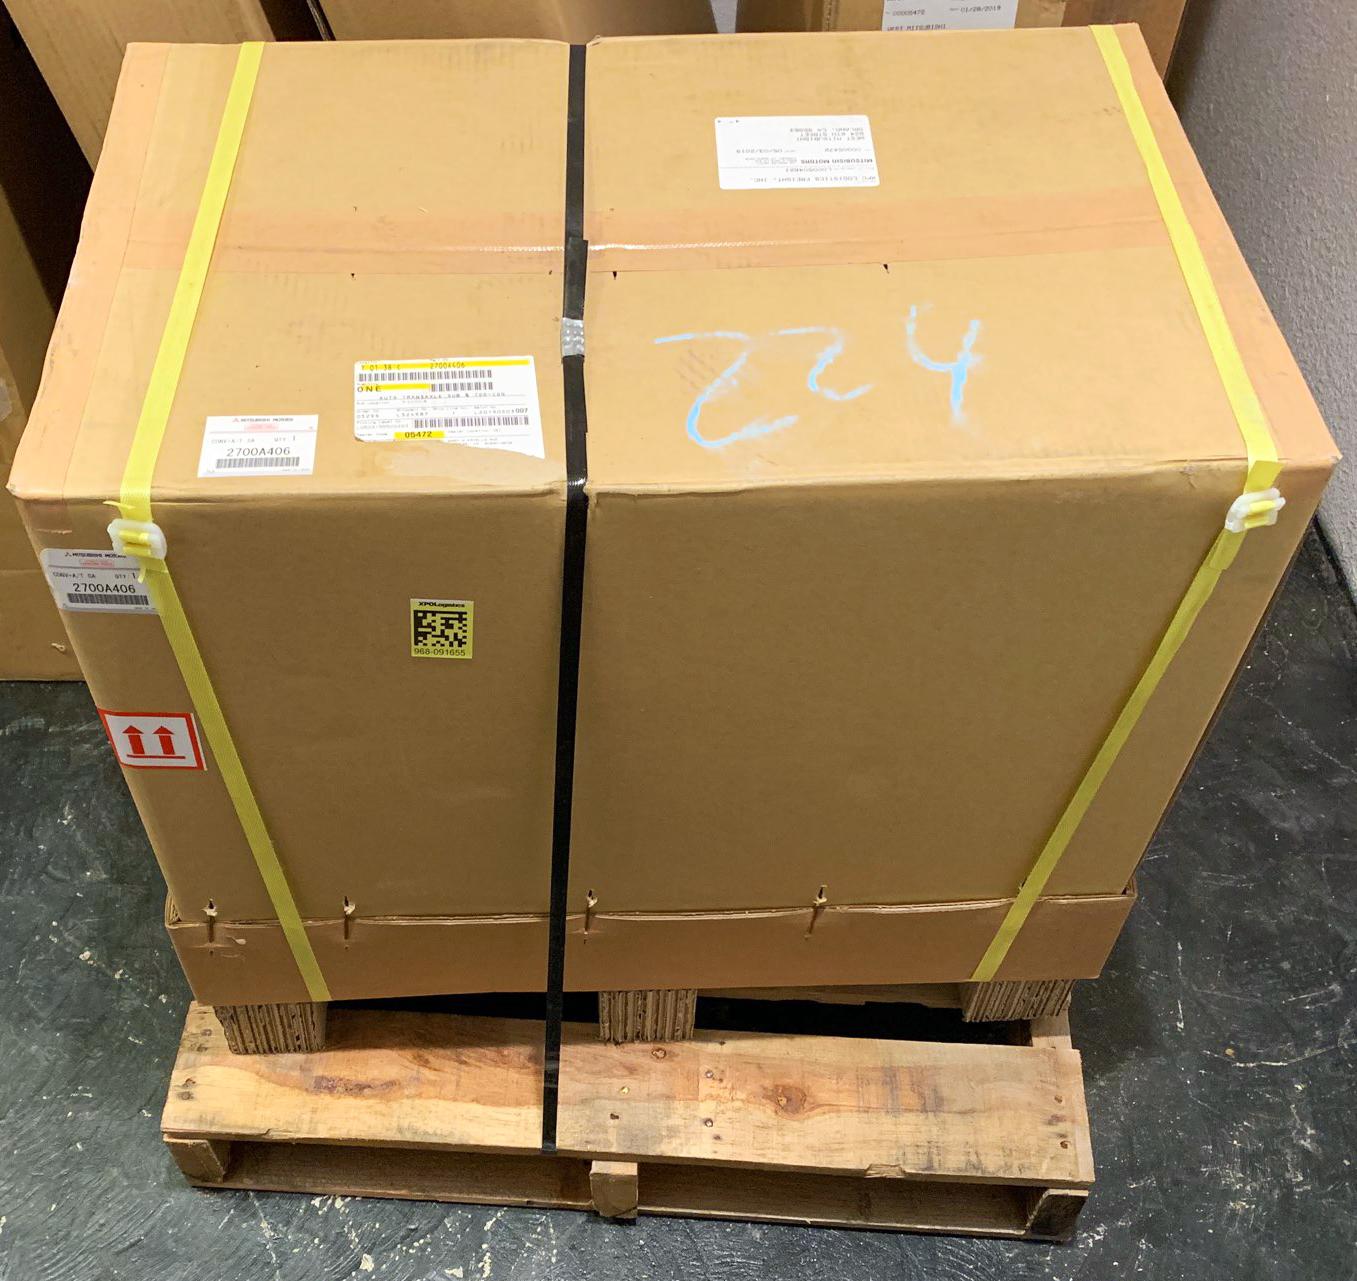 Boxed transmission 2